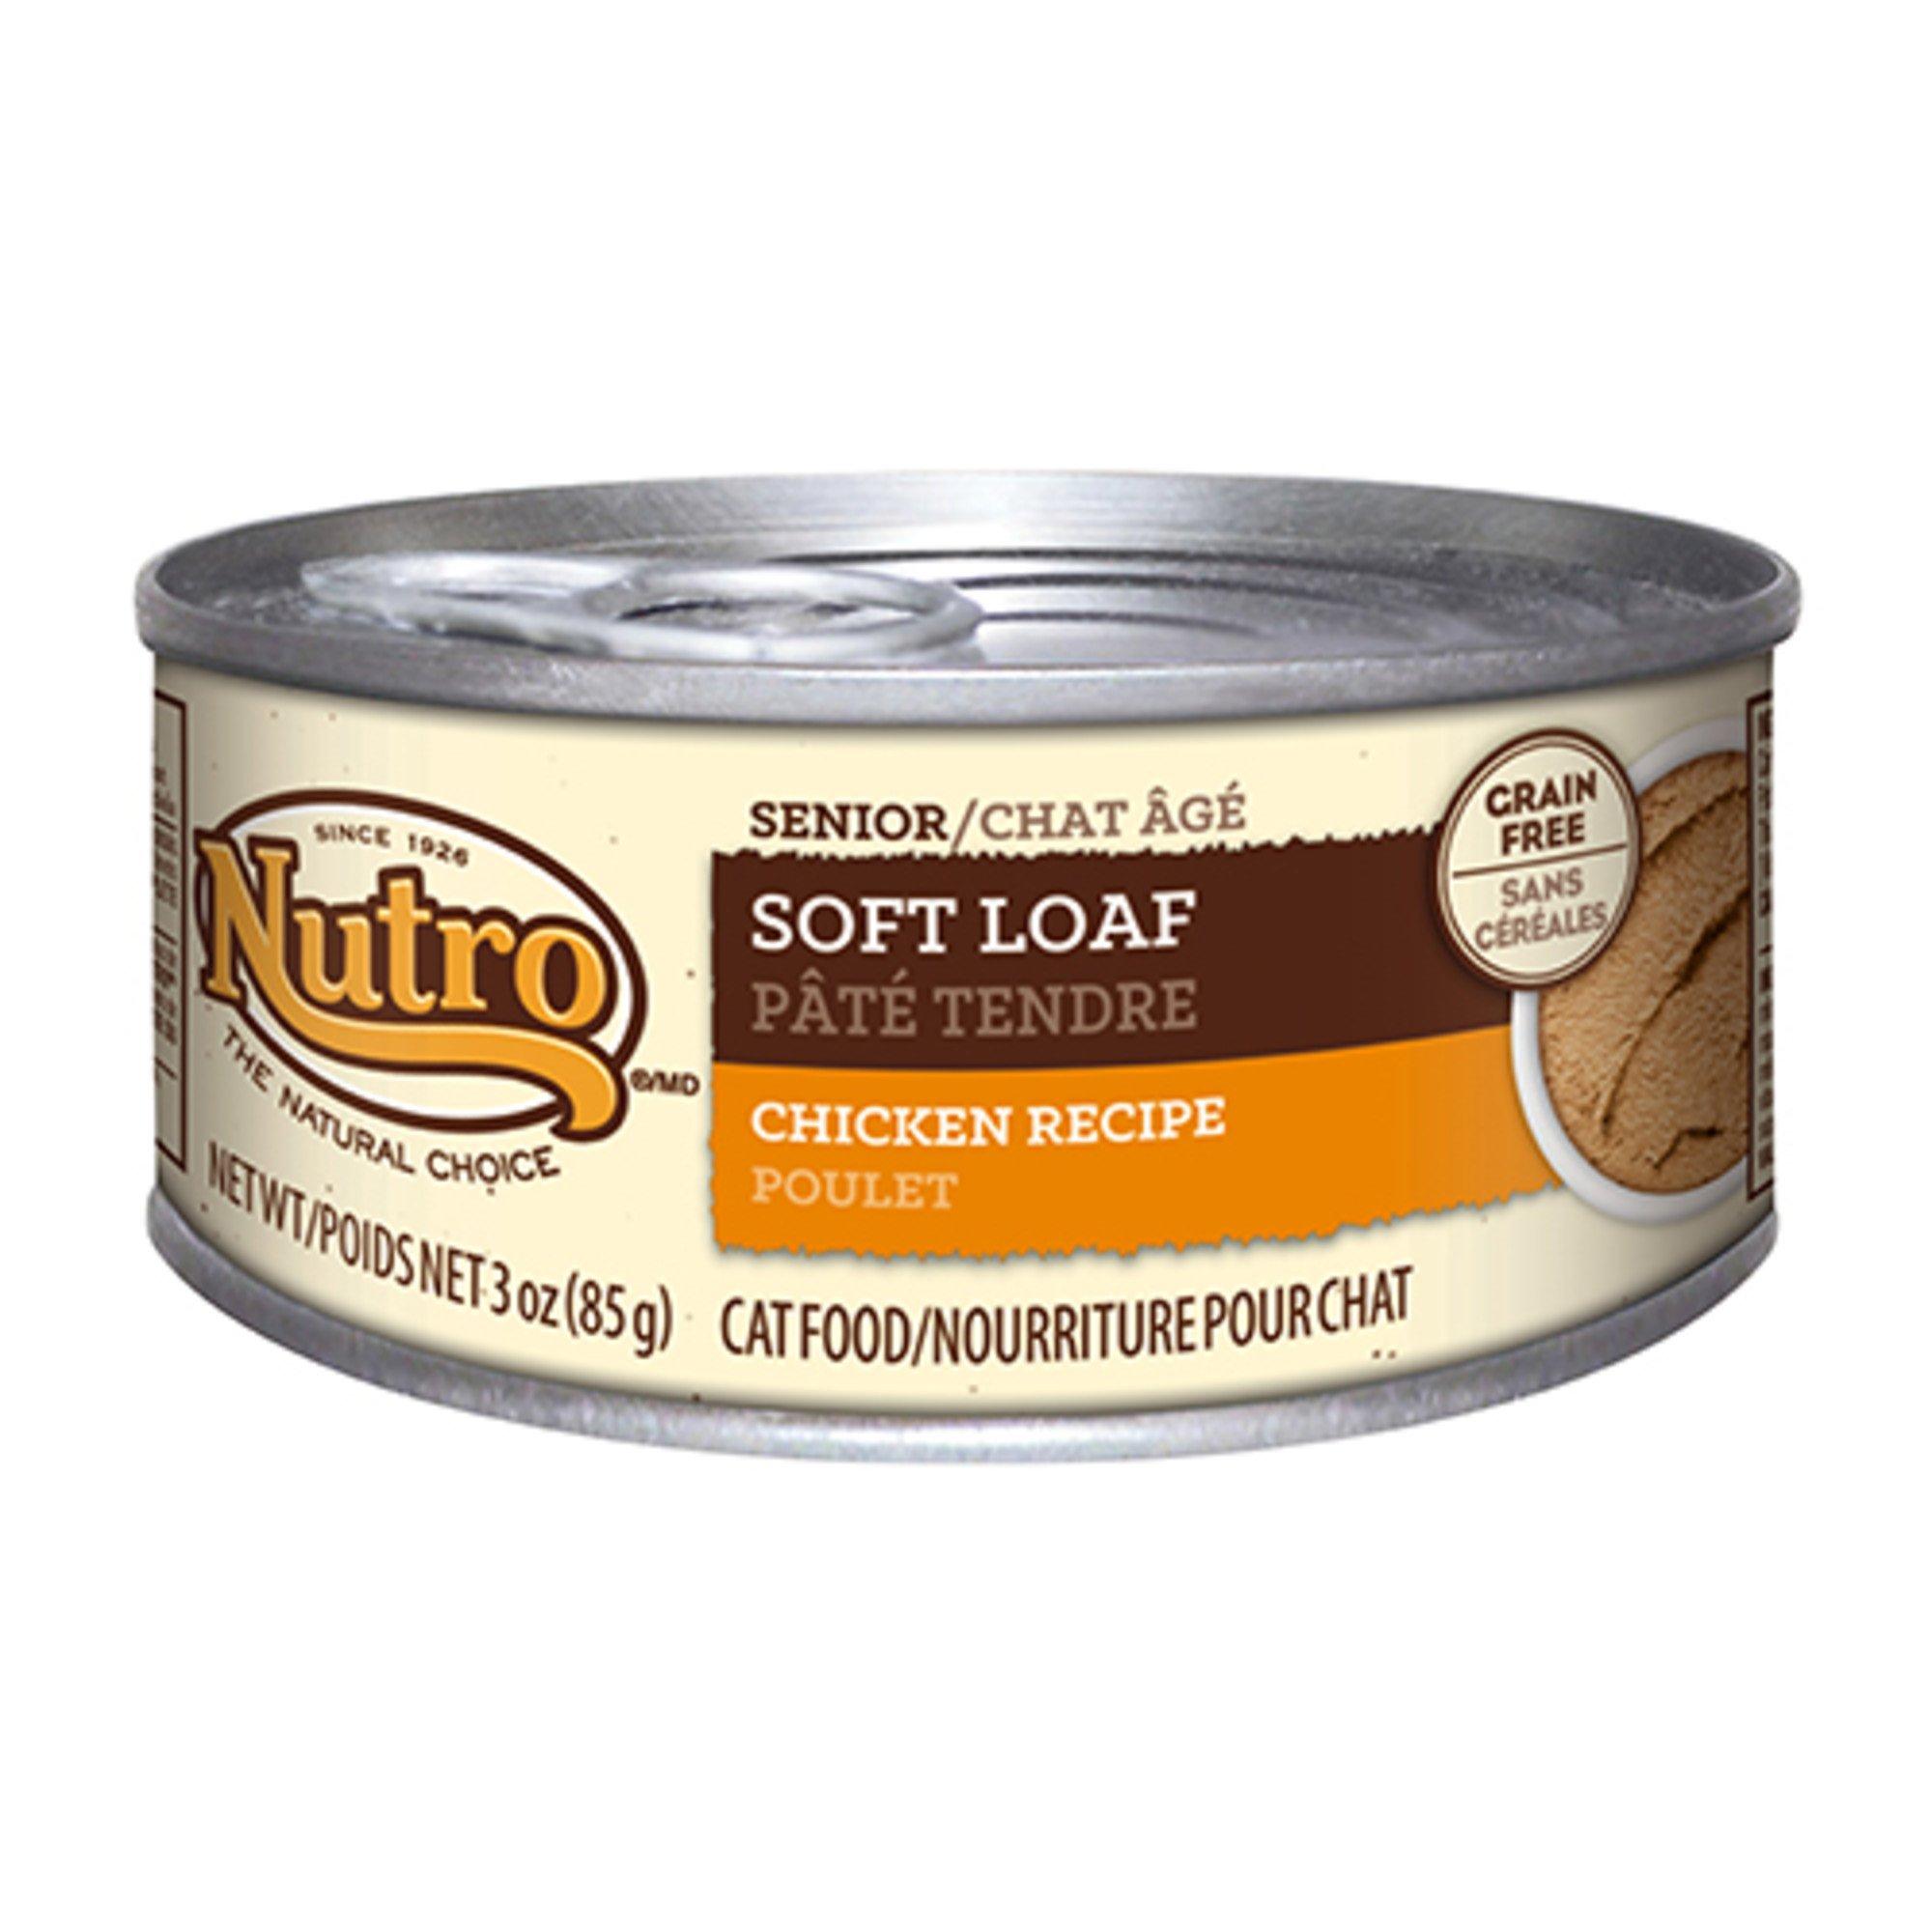 Nutro Soft Loaf Cat Food Petco